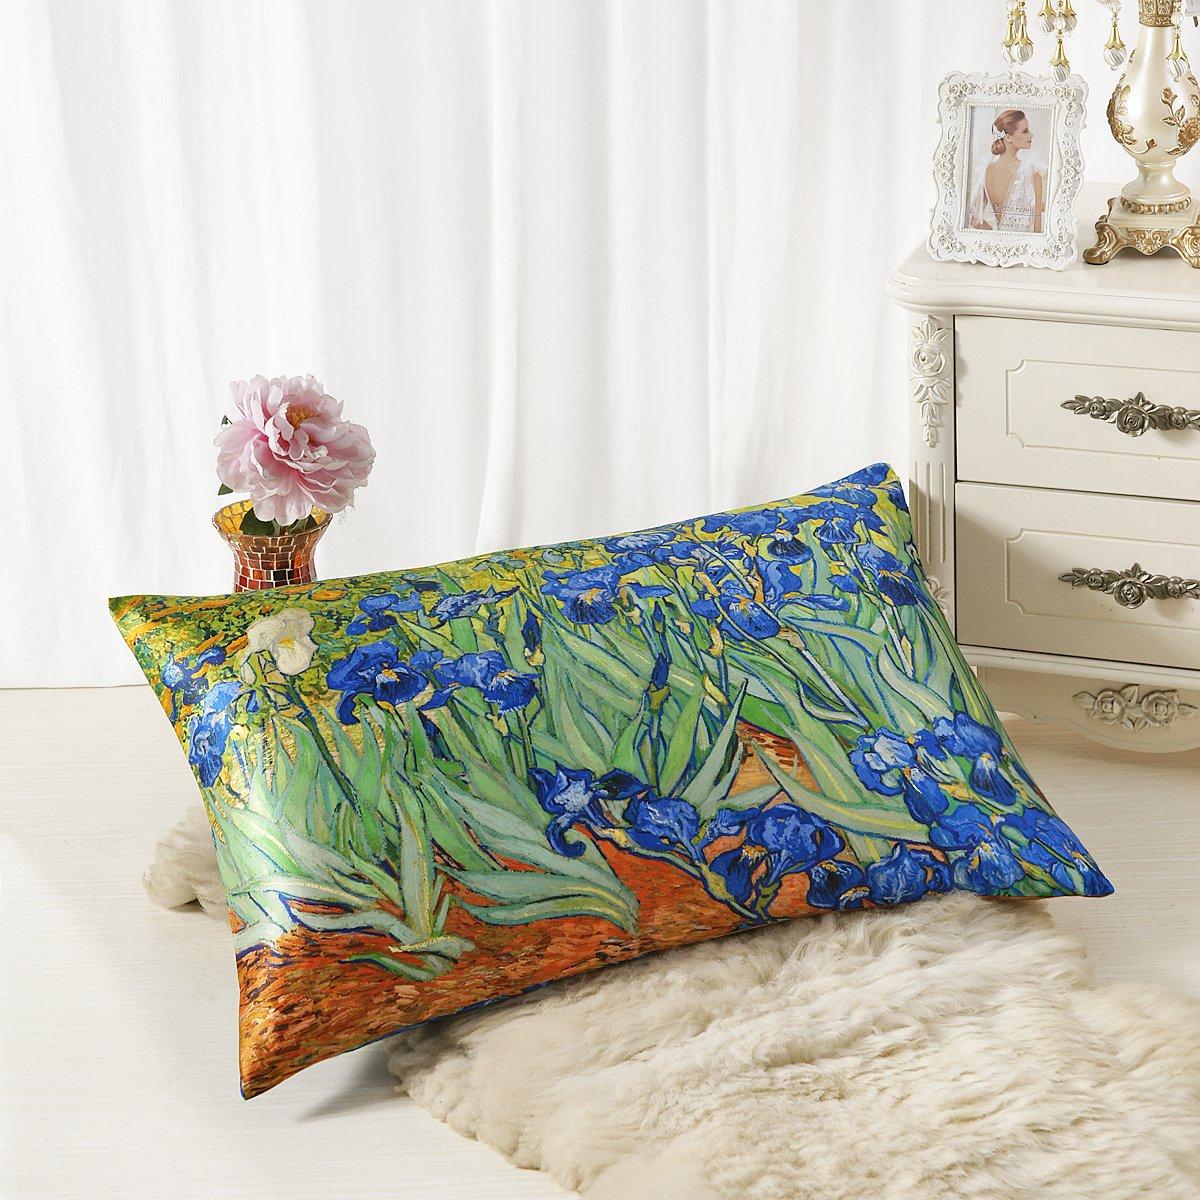 (King, Irises) ALASKA BEAR Natural Silk Pillowcase, Hypoallergenic, 19 momme, 600 thread count 100 percent Mulberry Silk, Queen Size with hidden zipper (King, Irises) B0739WJ5Z4 キング,Irises